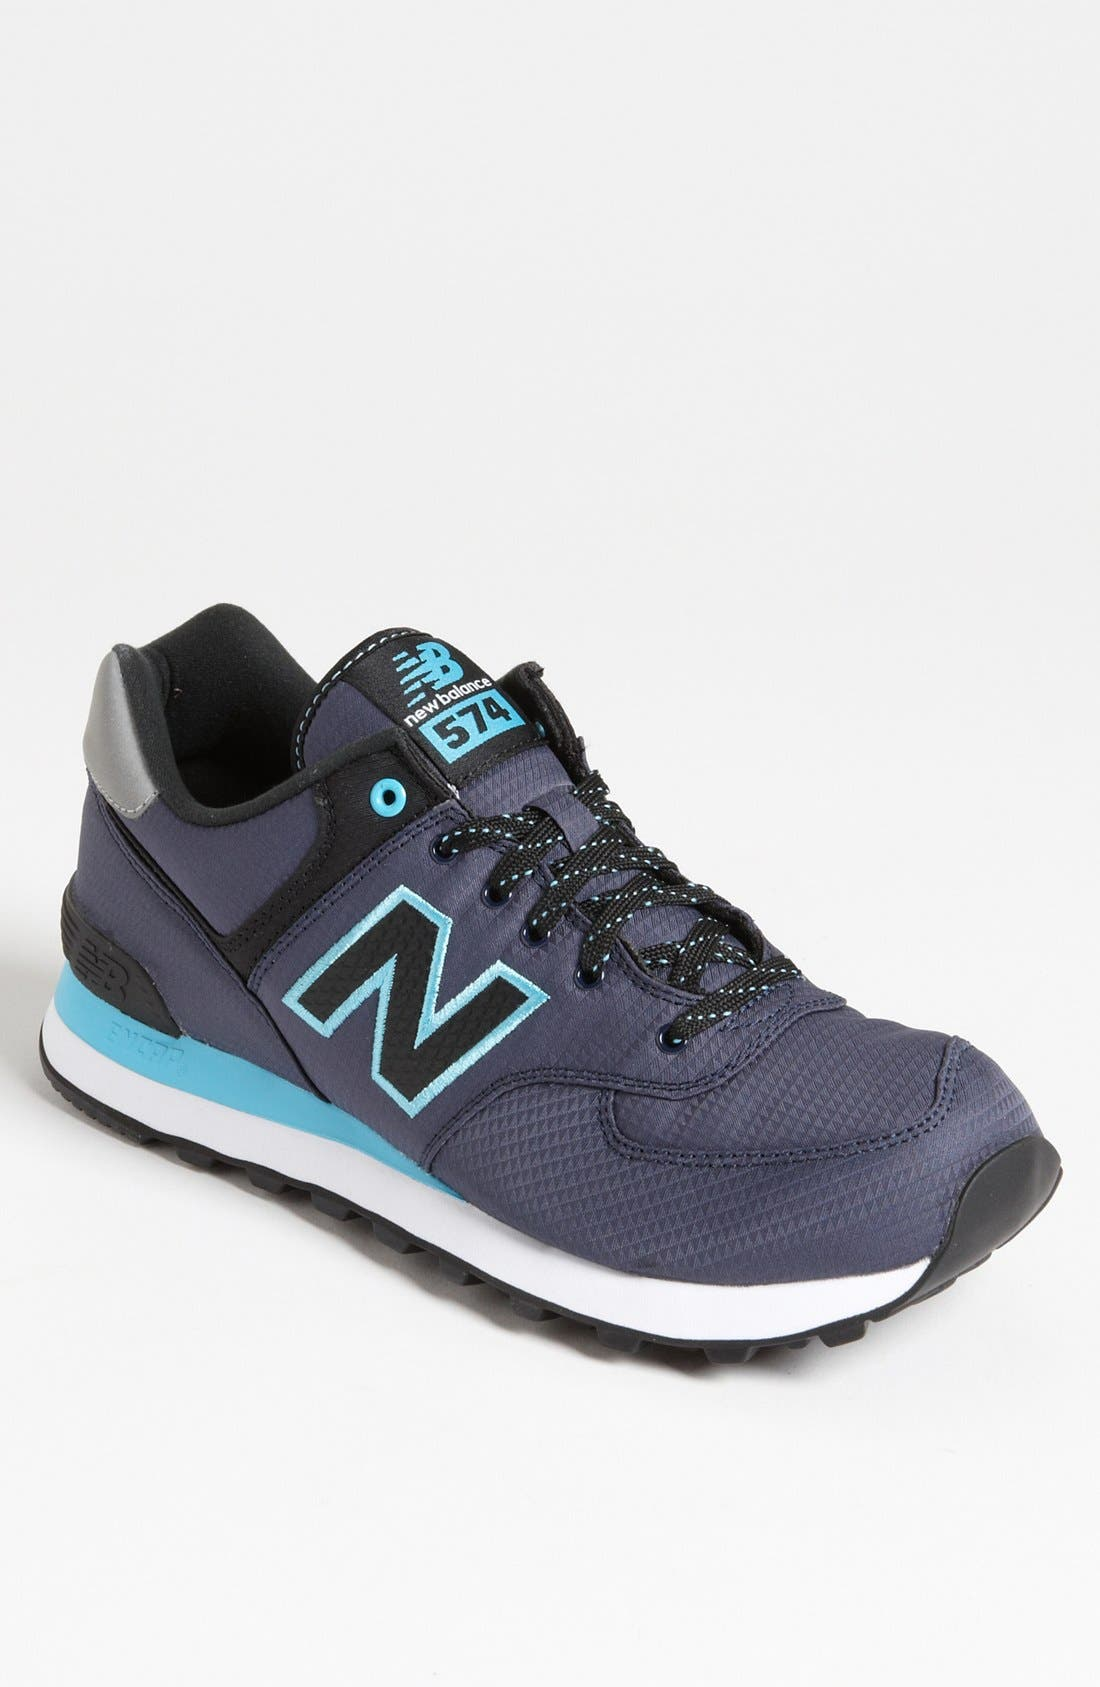 Alternate Image 1 Selected - New Balance '574 - Windbreaker' Sneaker (Men)